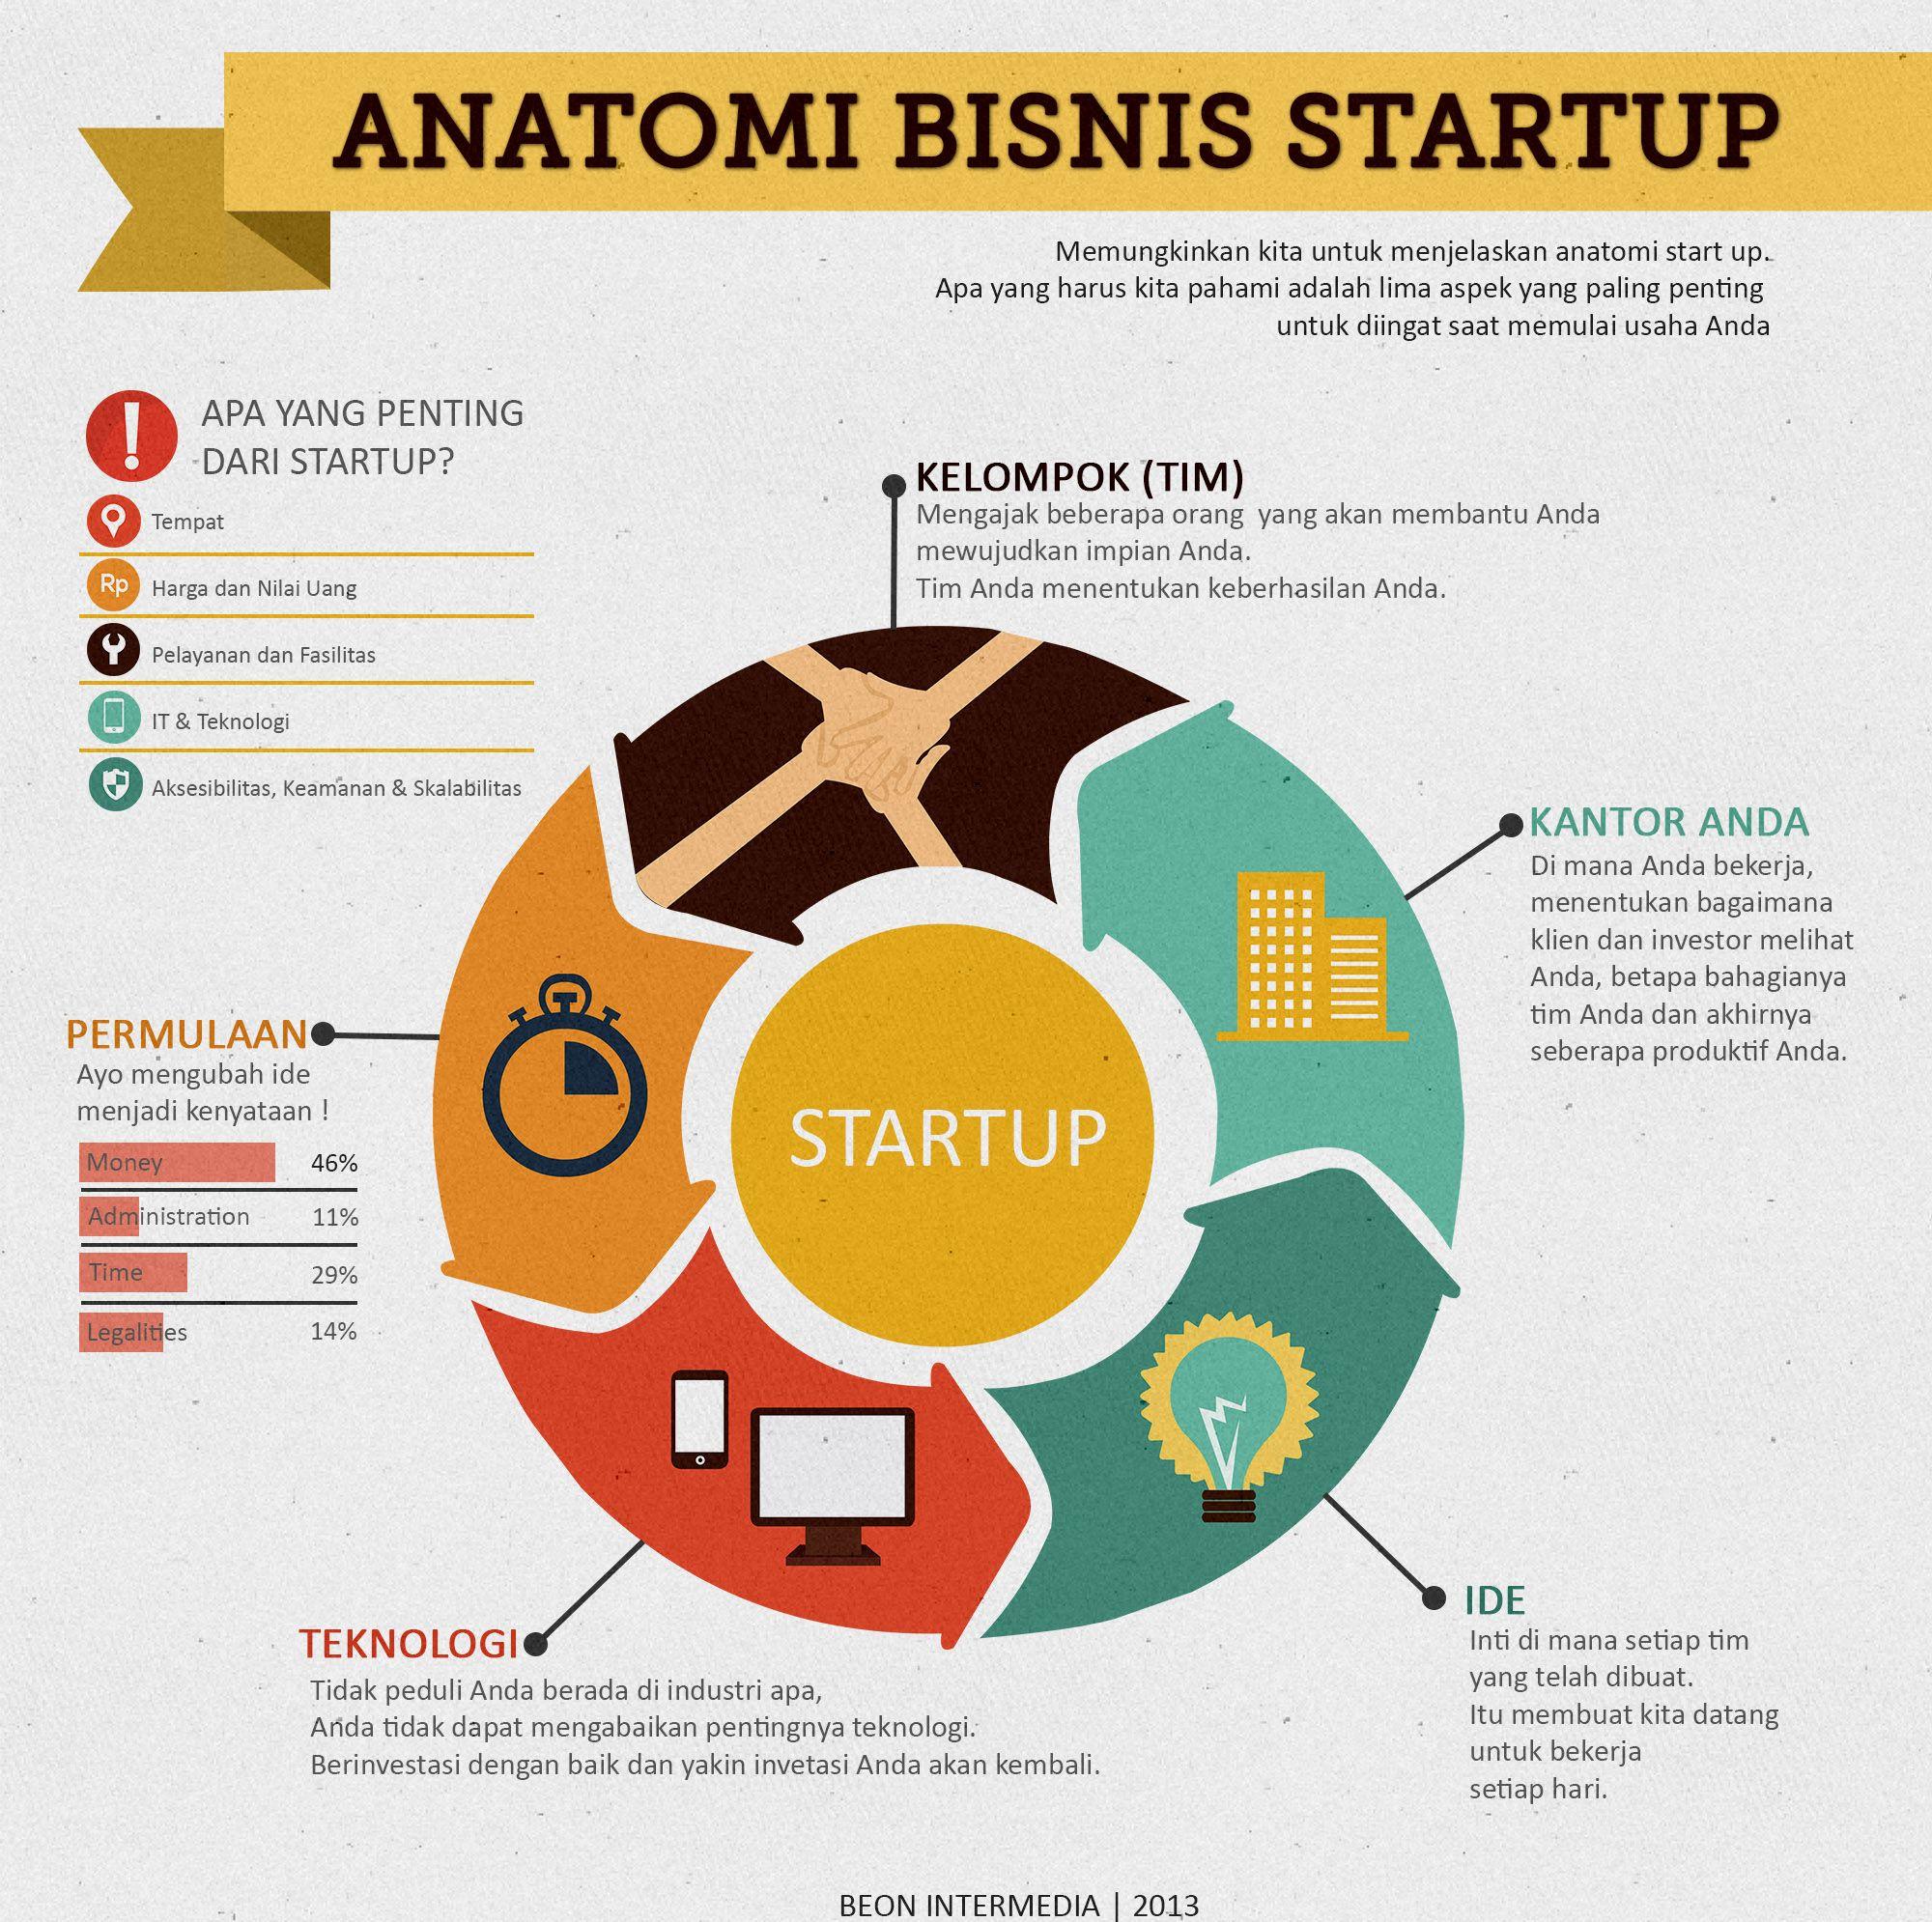 [Infografis] 5 Anatomi Bisnis Startup | Media Bisnis Online